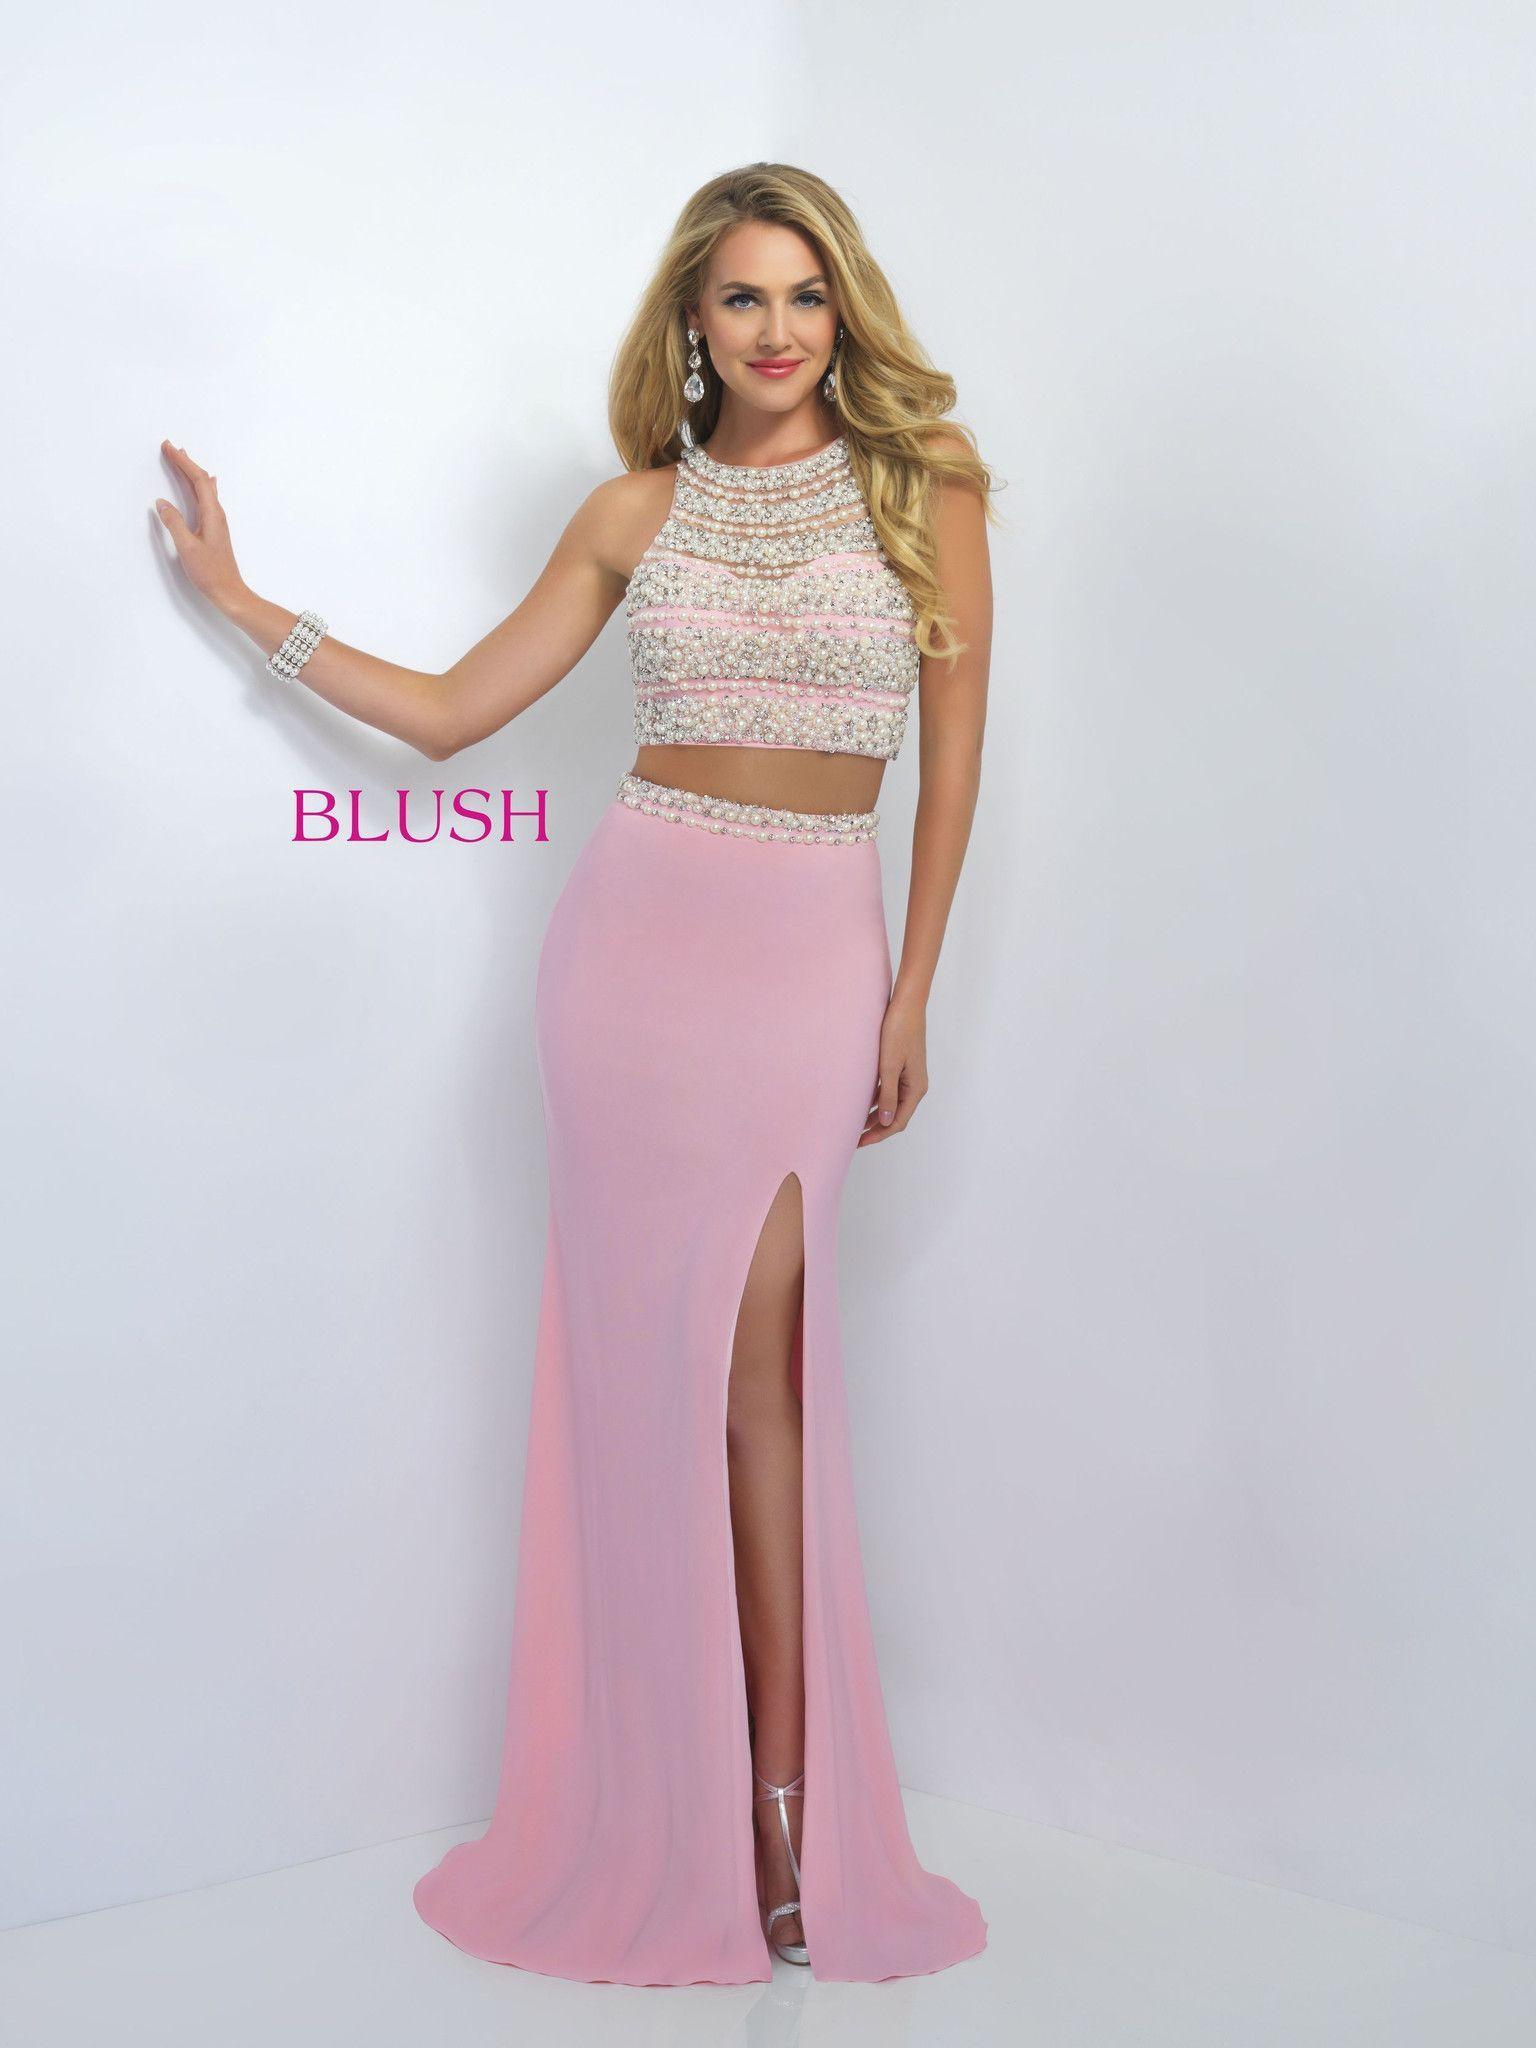 Blush prom petal pinkpearl products pinterest blush